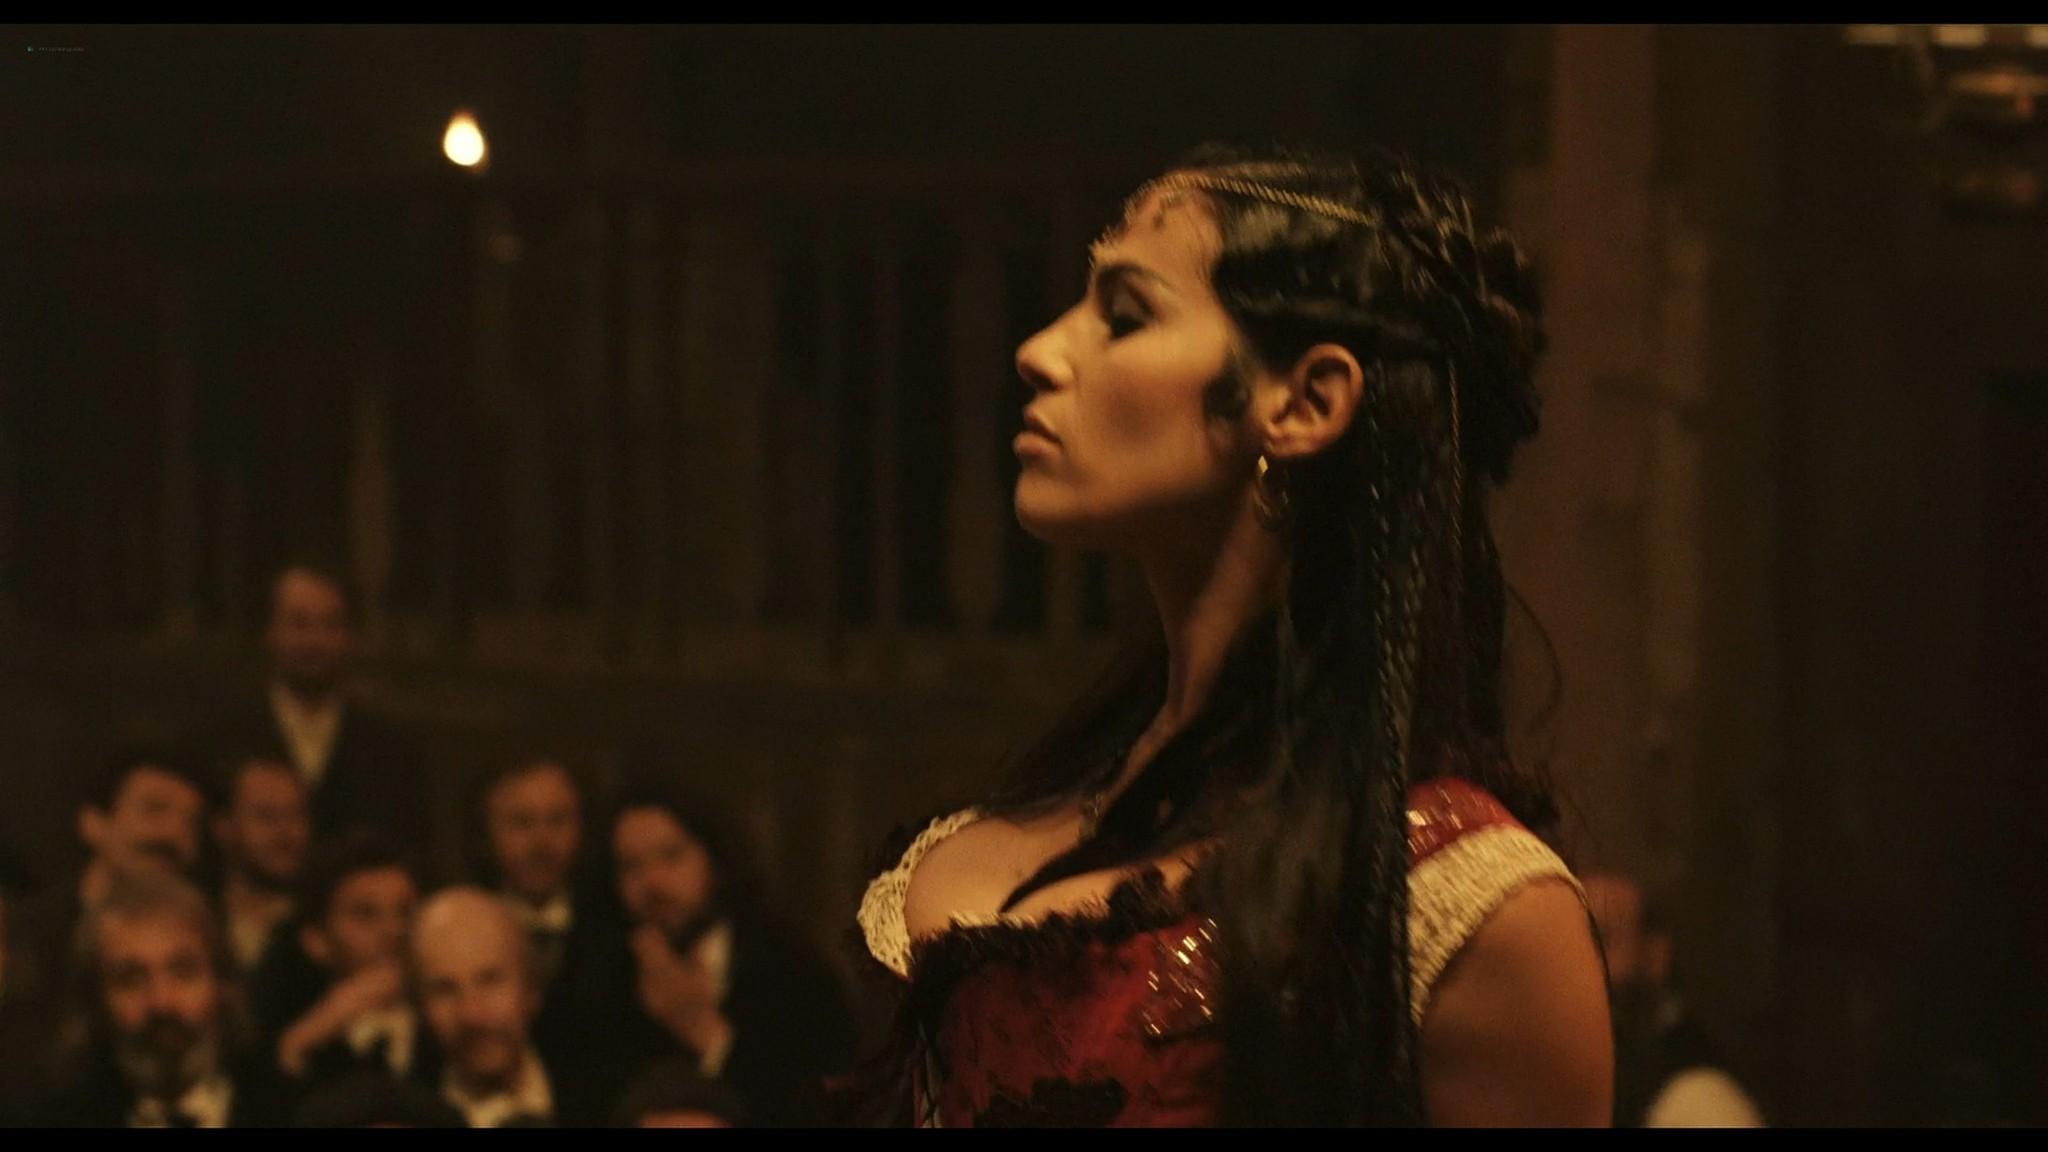 Laetitia Casta nude topless and very hot La jeune fille et les loups 2007 HD 1080p BluRay 13